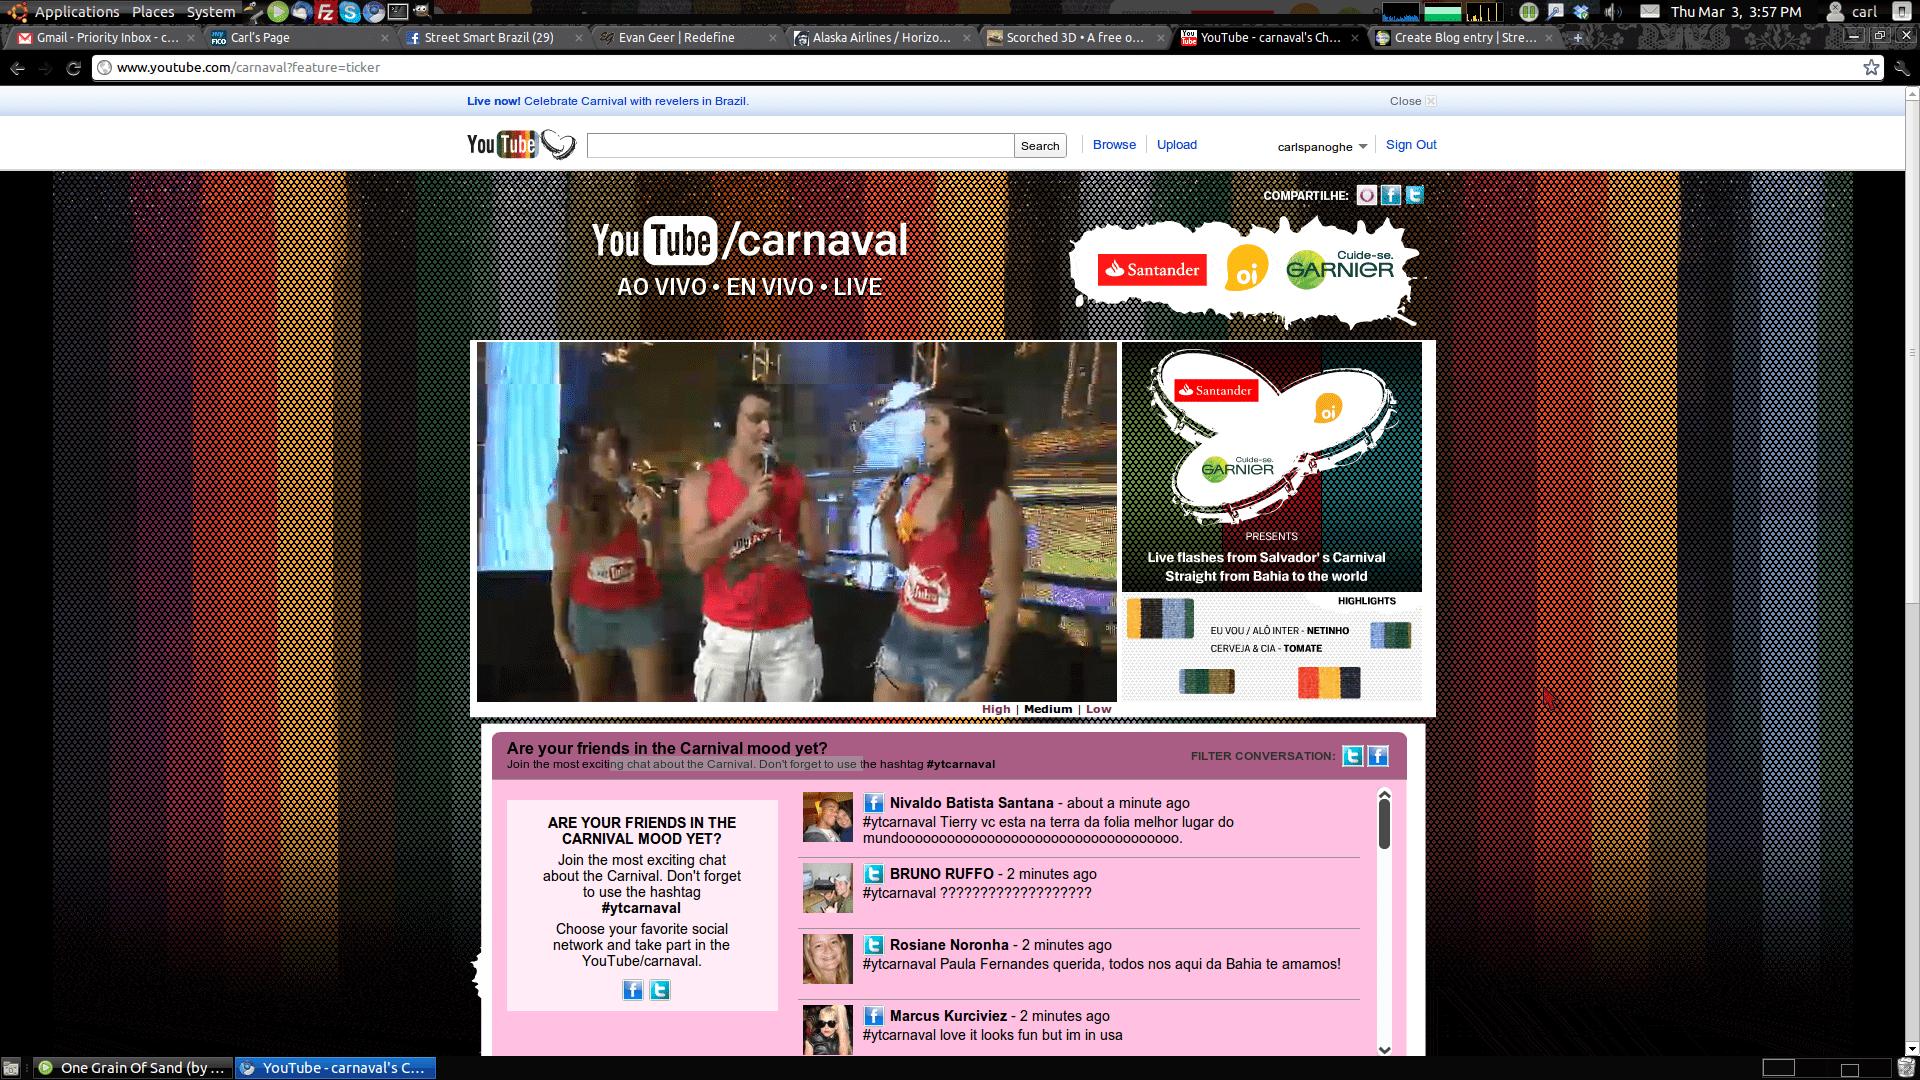 youtube streaming carnival live street smart brazil